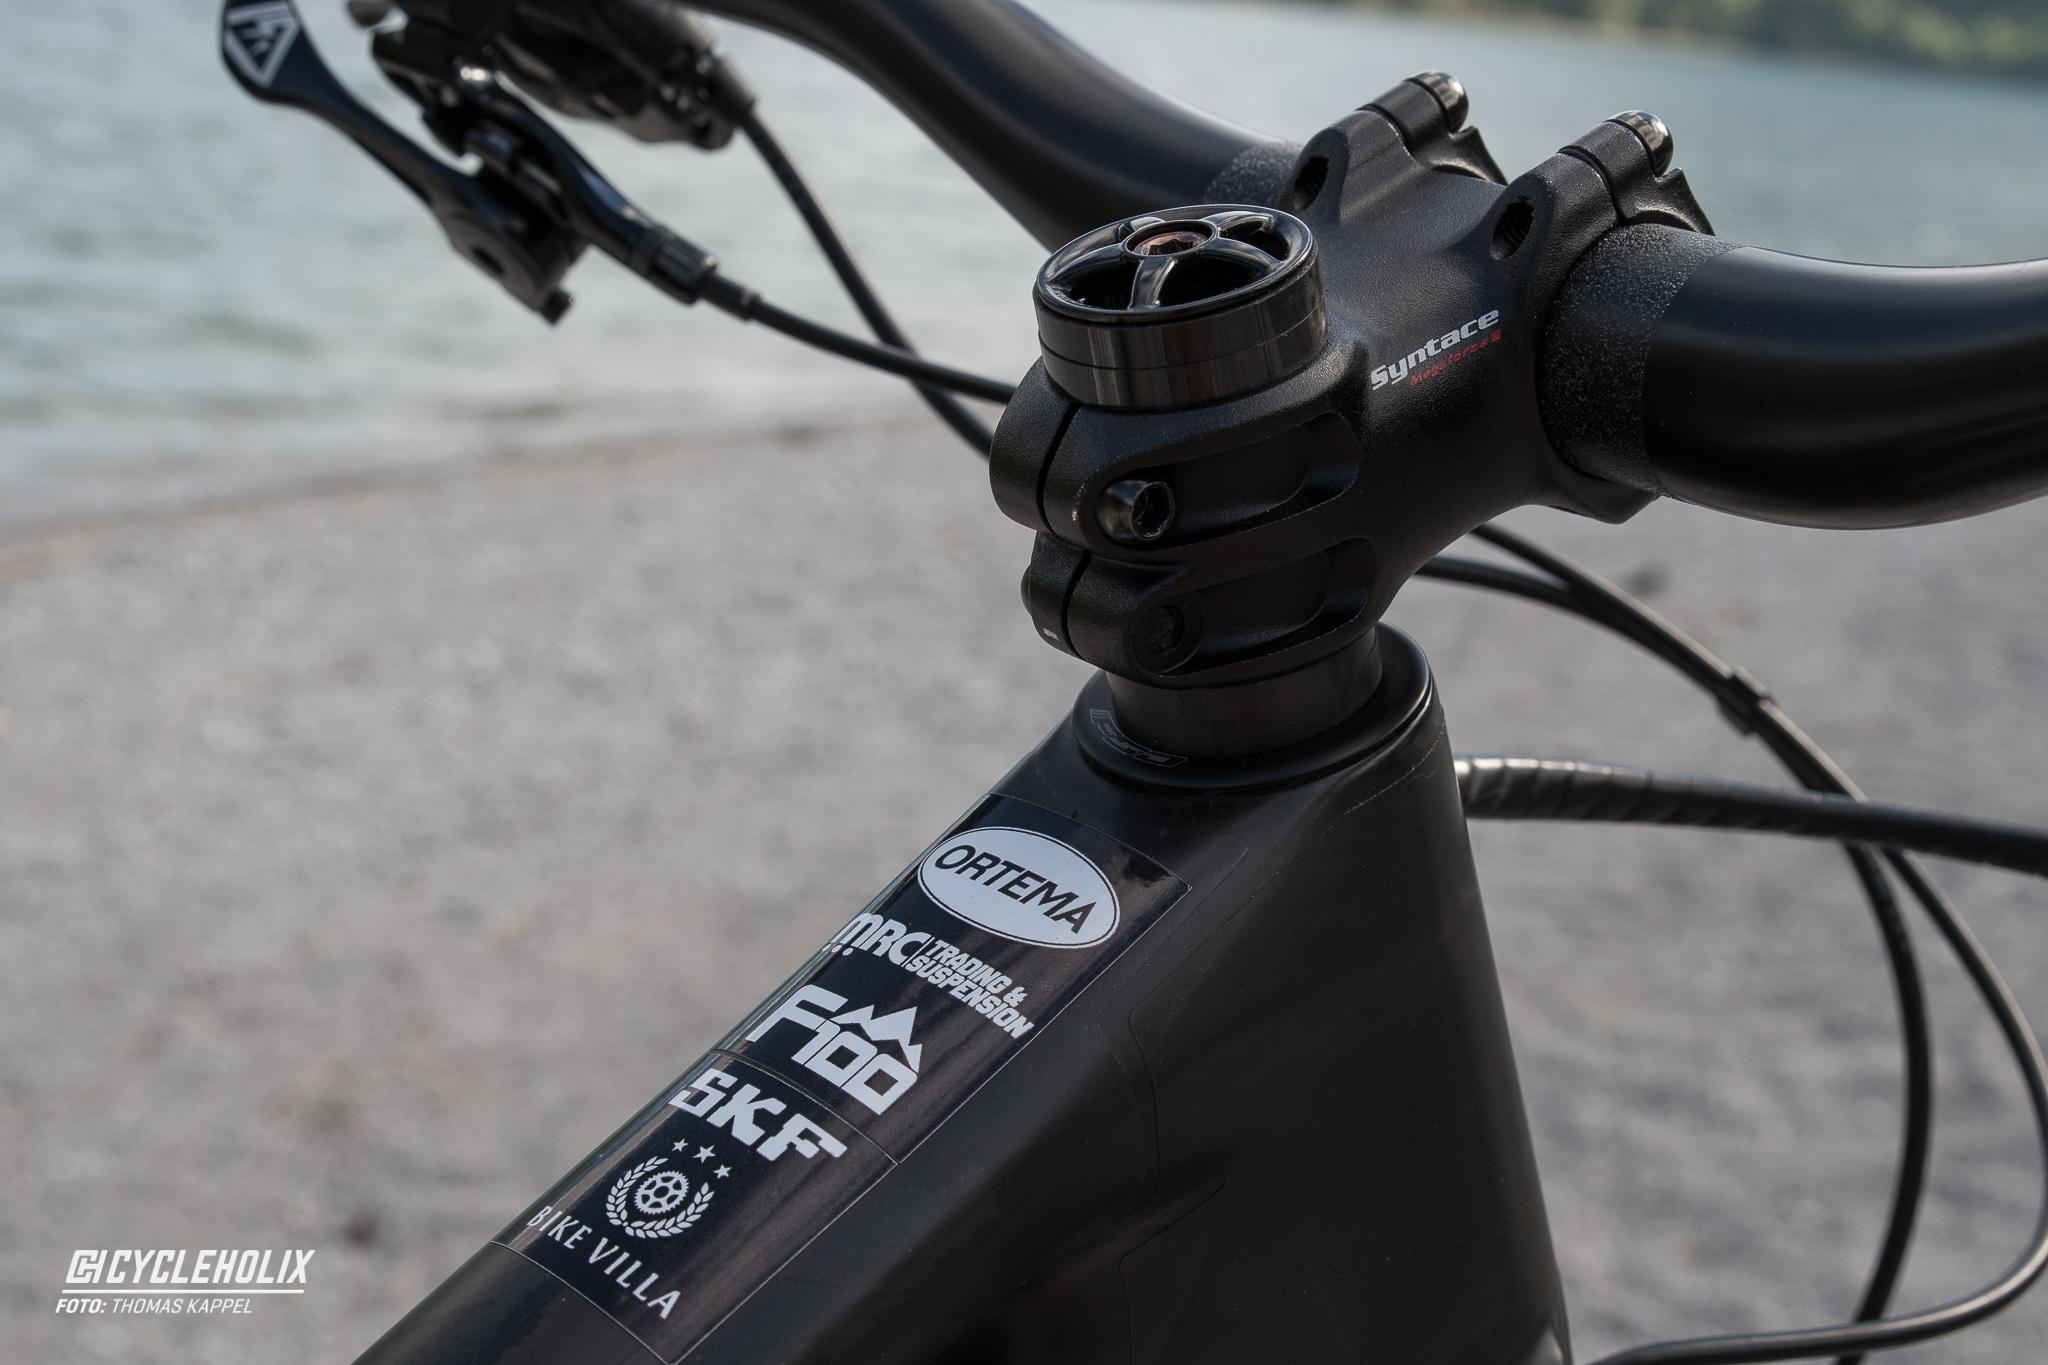 2019 Leo Kast Bikecheck 7